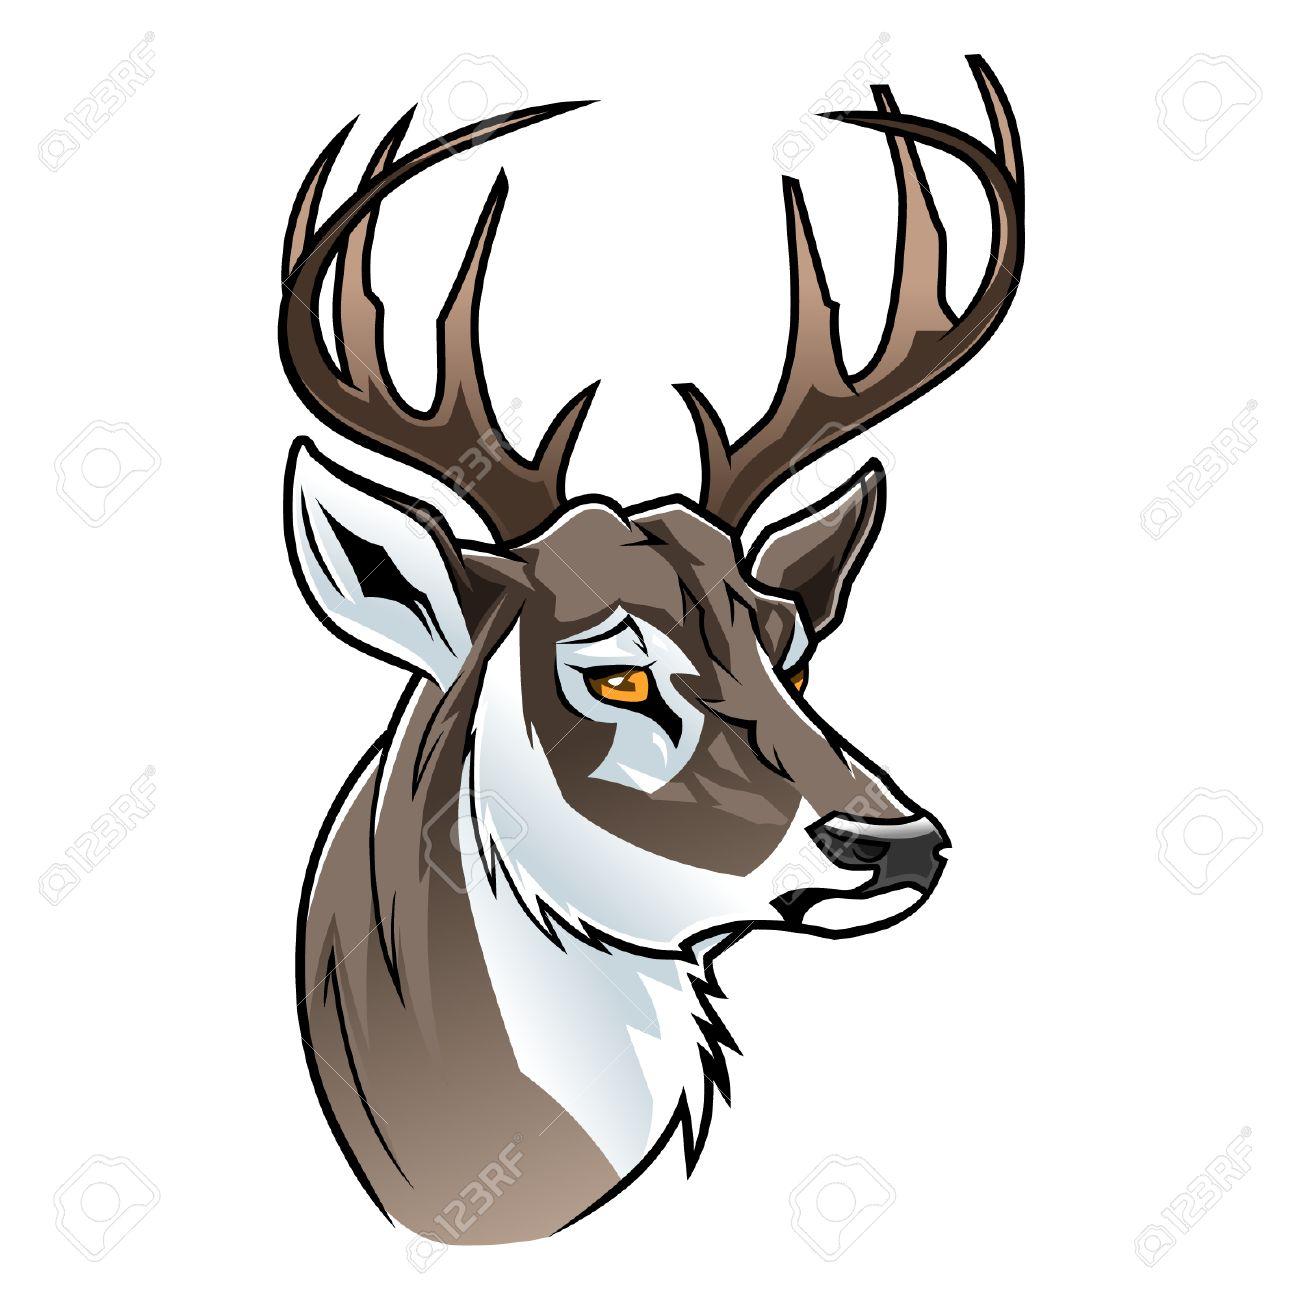 cartoon deer head royalty free cliparts vectors and stock rh 123rf com cartoon deer head silhouette cartoon deer in headlights